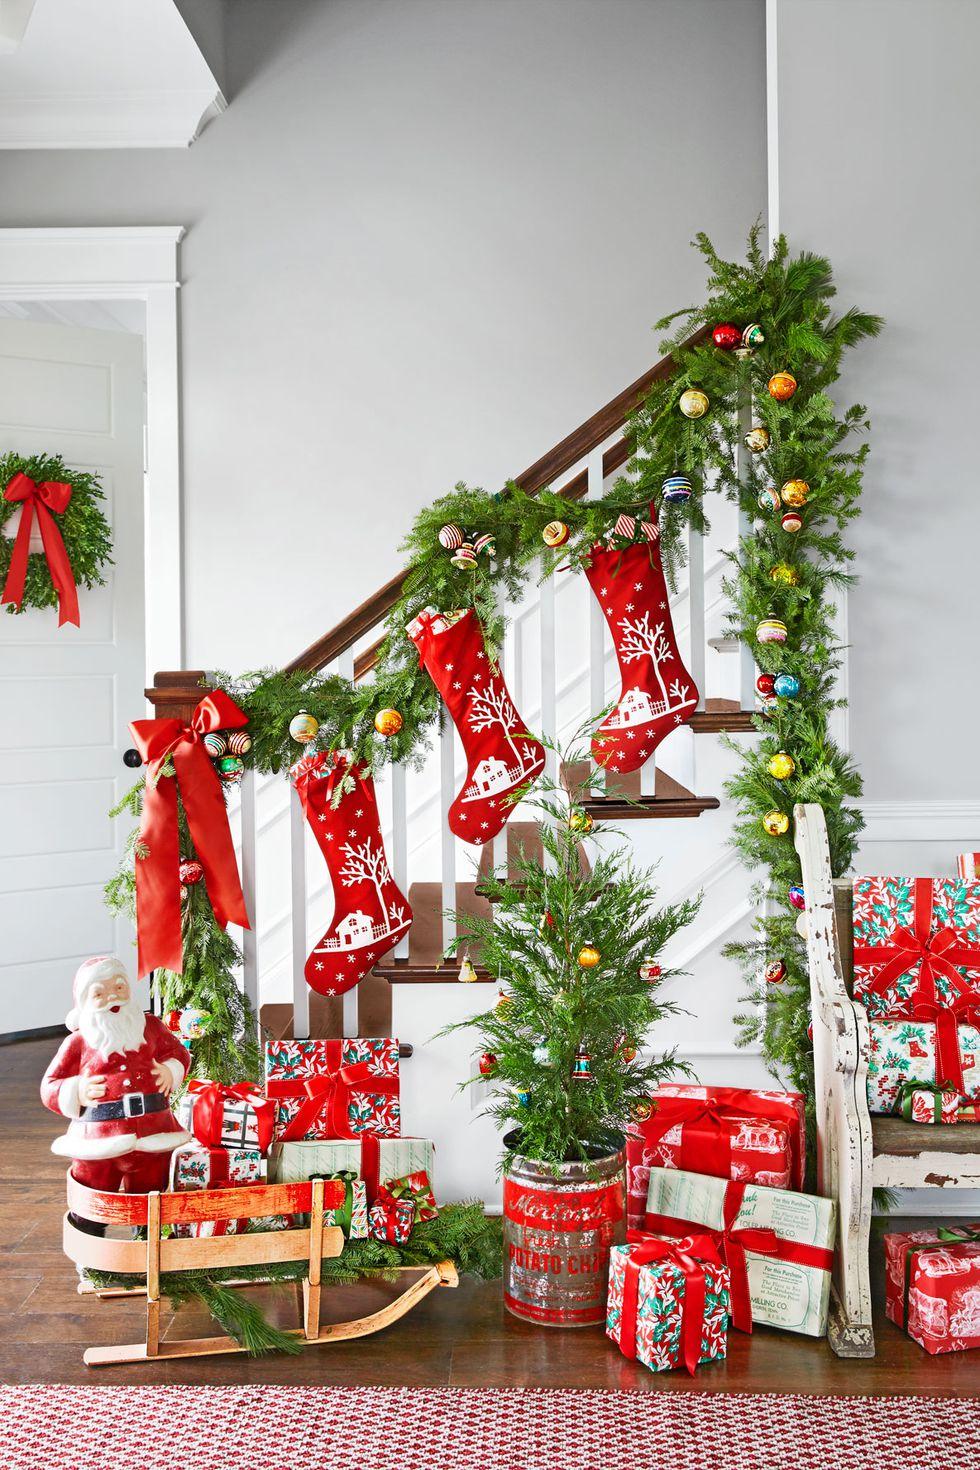 1478275490-spirit-christmas-past-stairway-1216.jpg